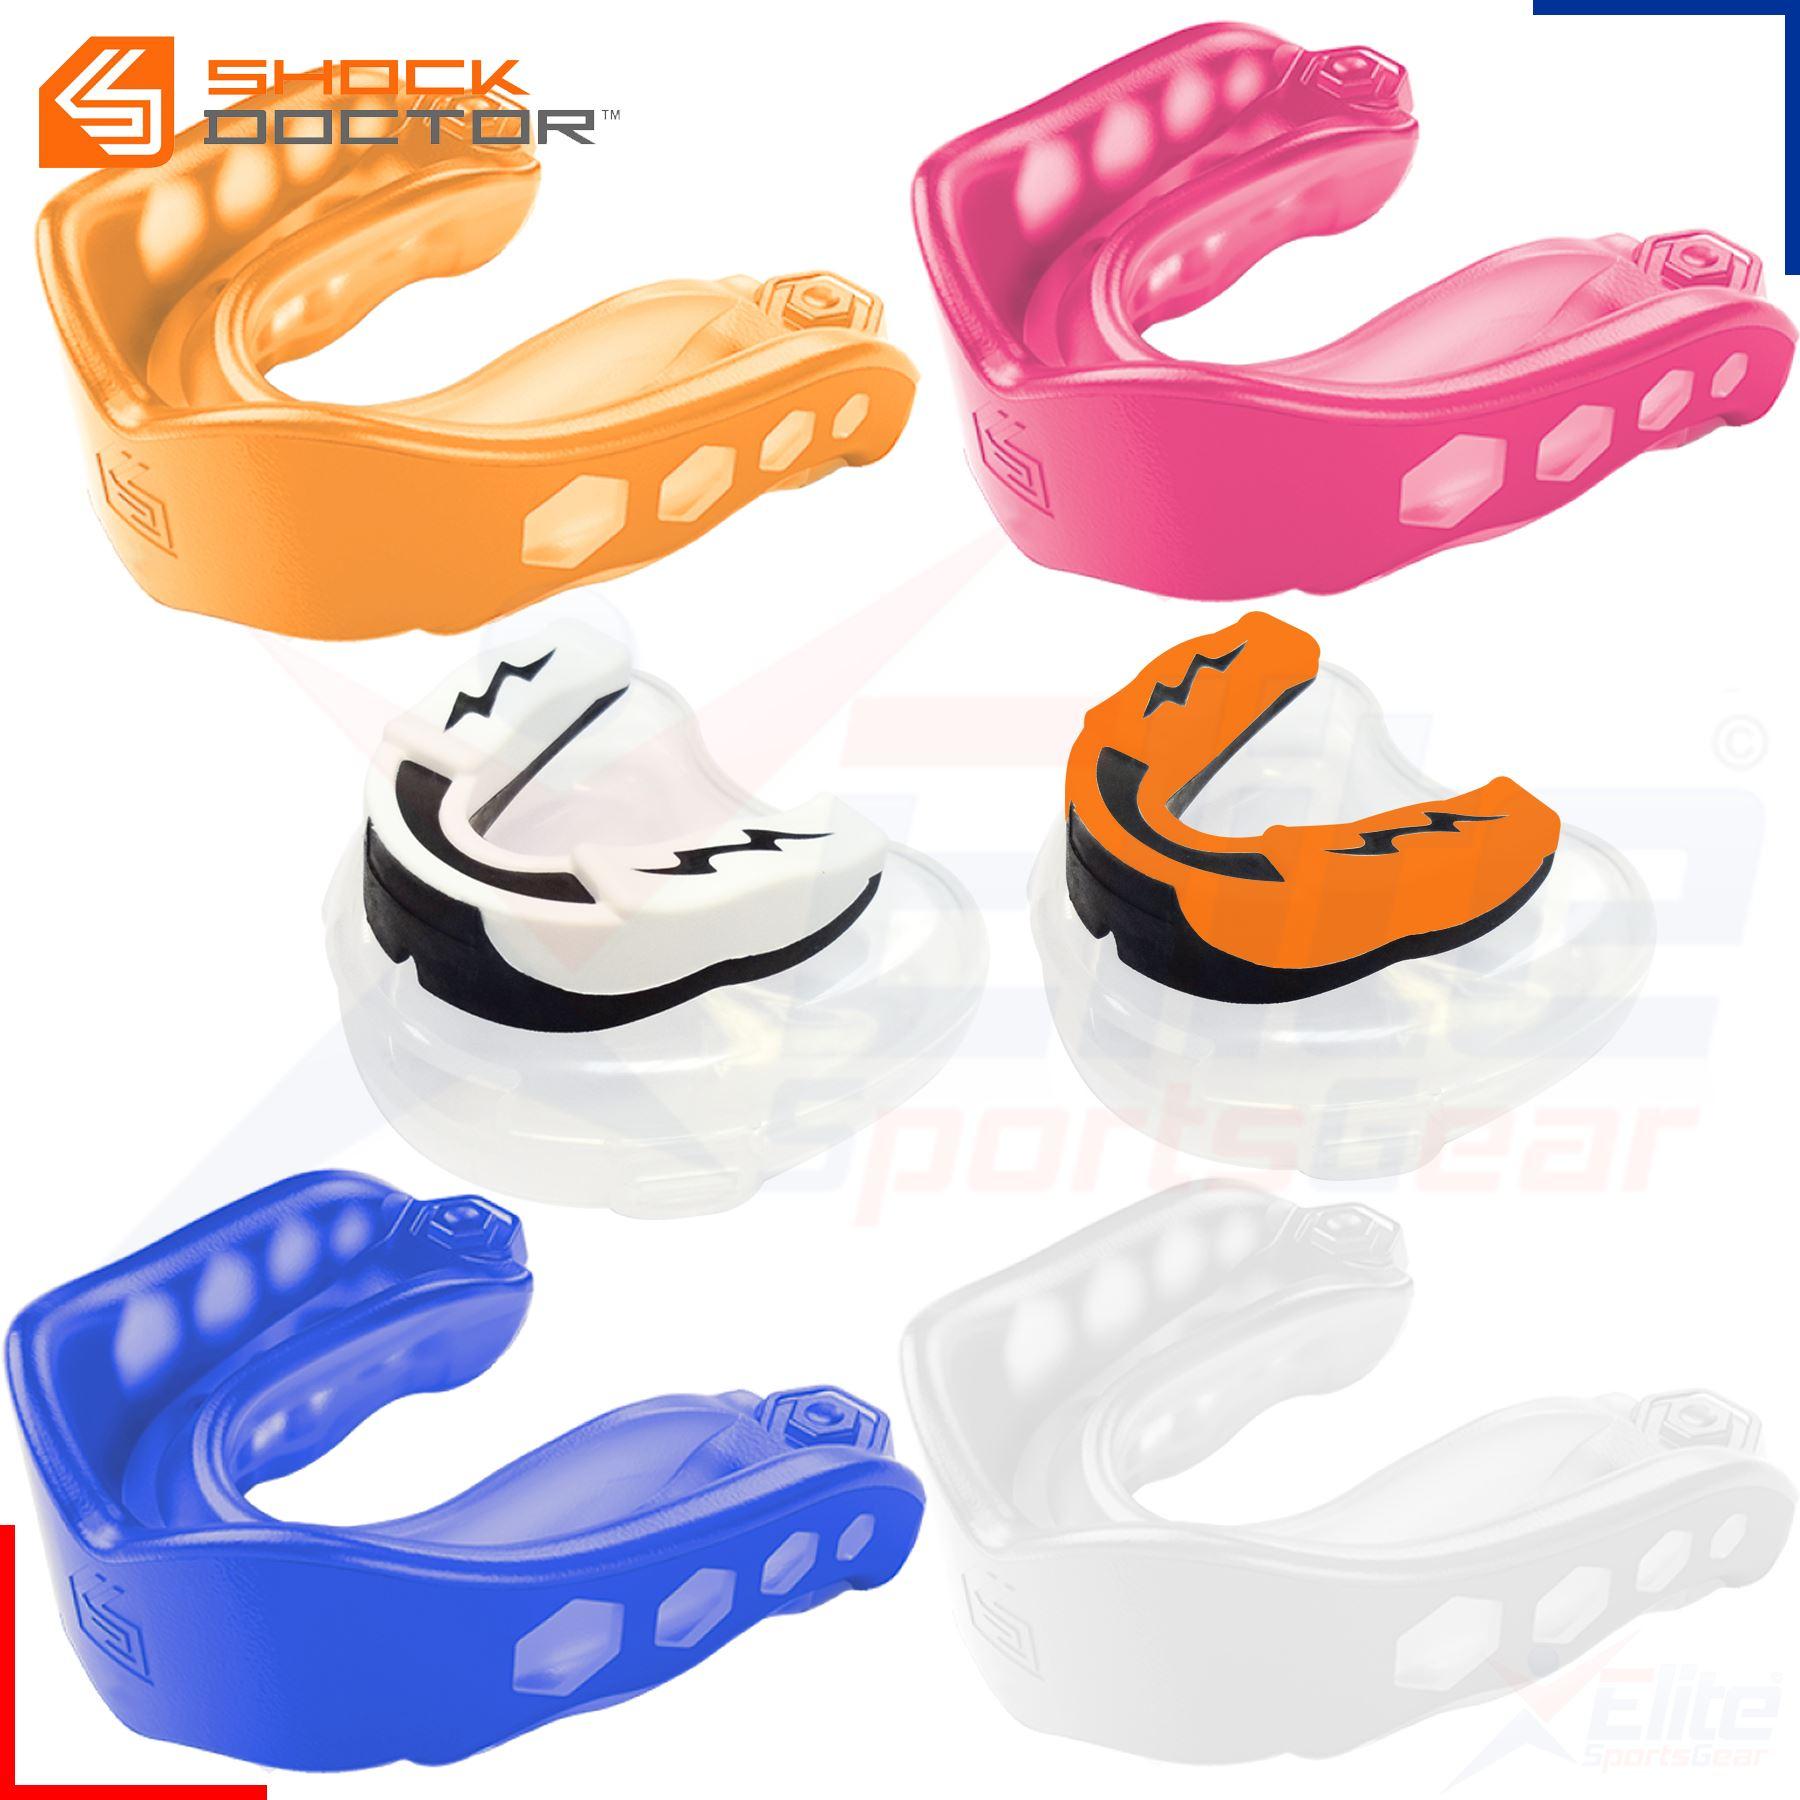 Shock Doctor v2 Gel Max Mouth Guard Mouthguard Gum Shield Orange Pink